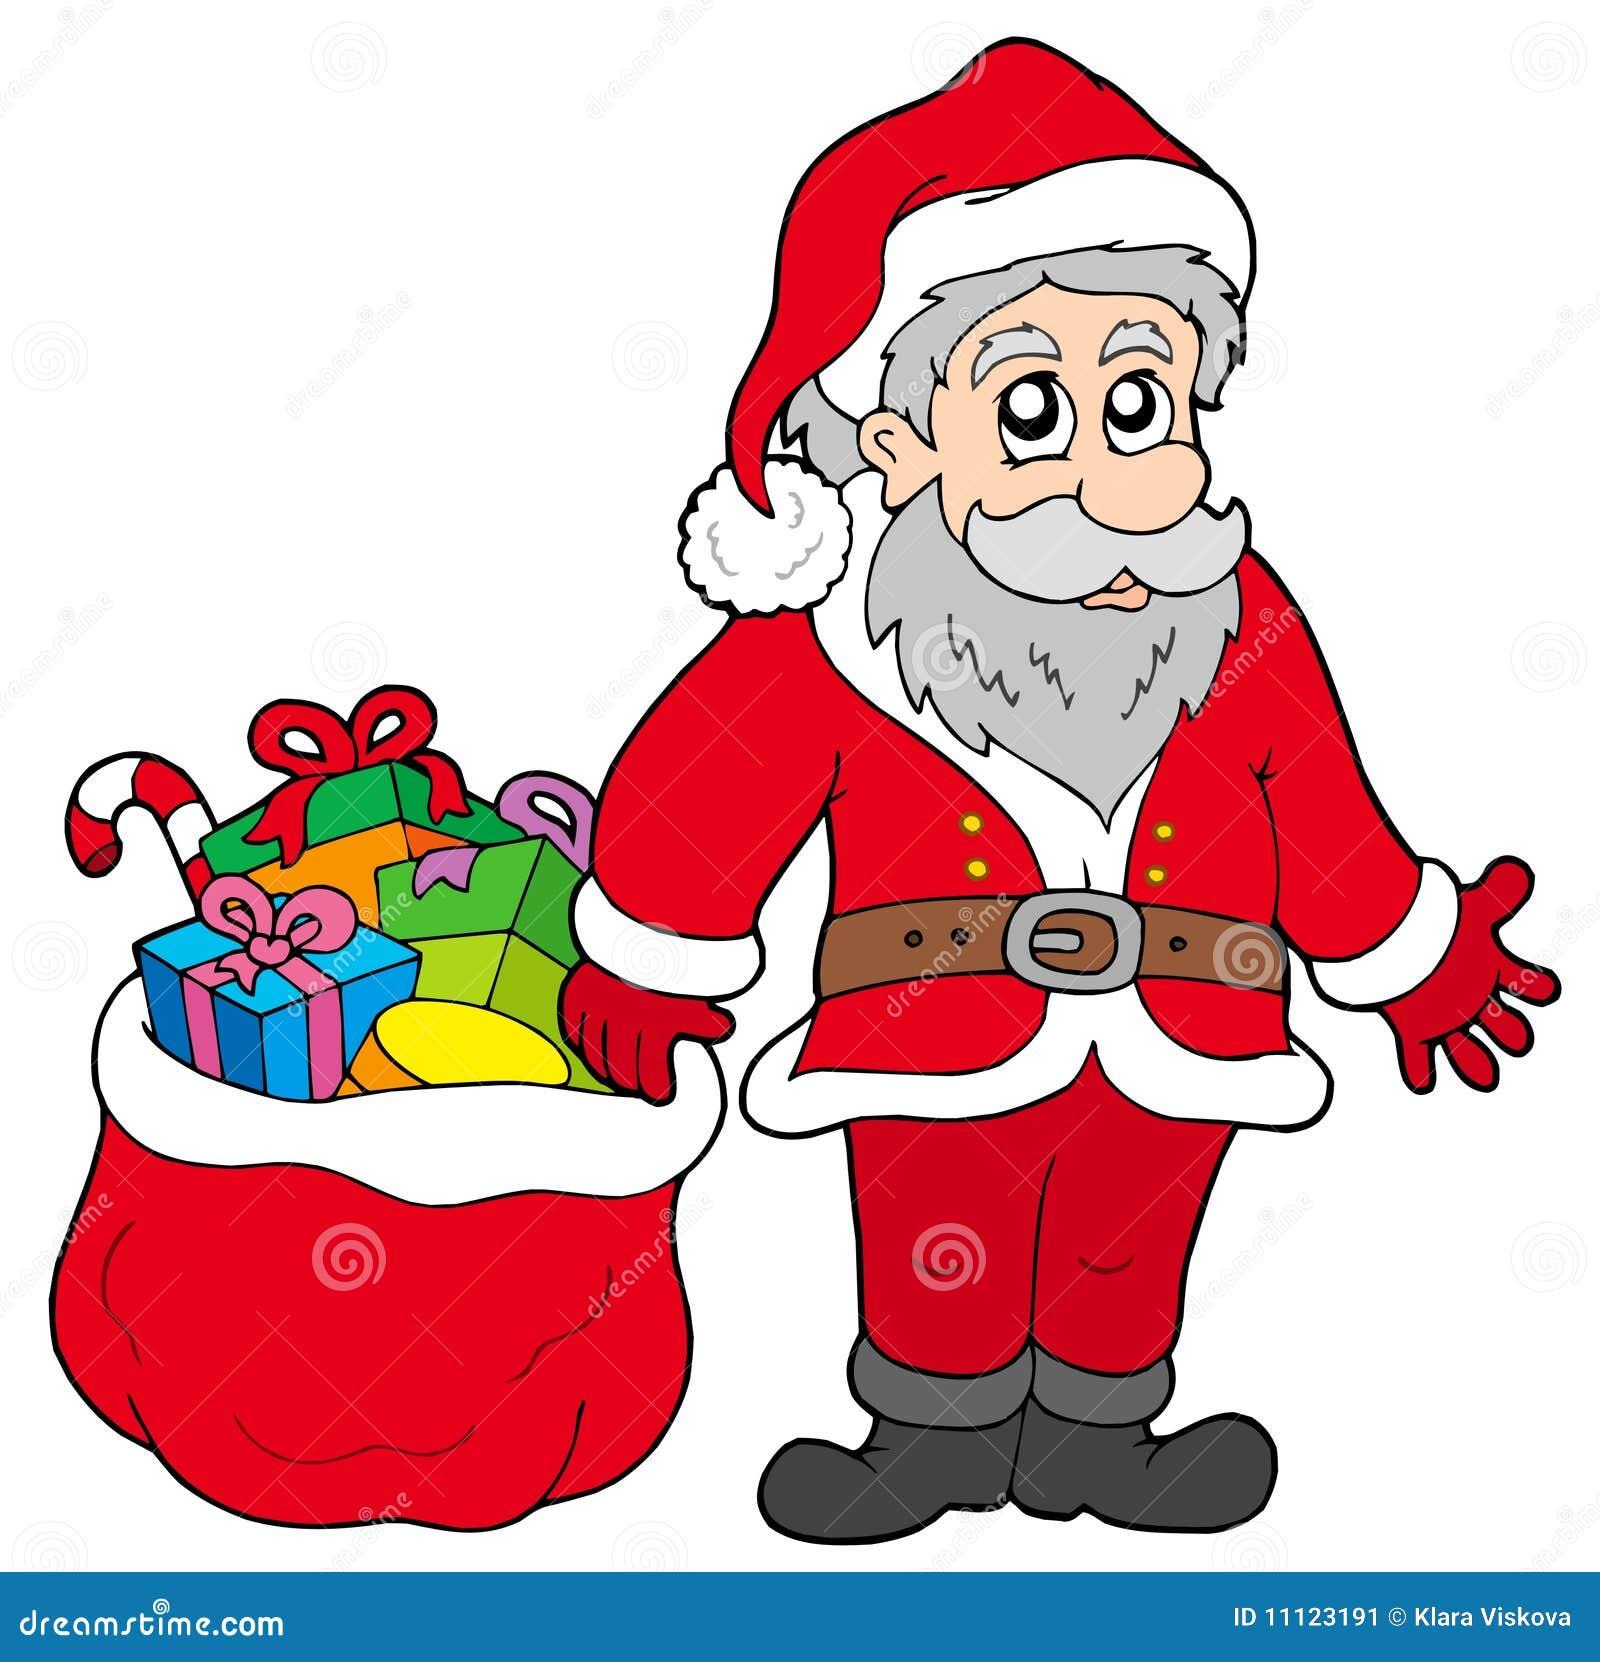 happy santa claus with gifts - Santa Claus Gifts